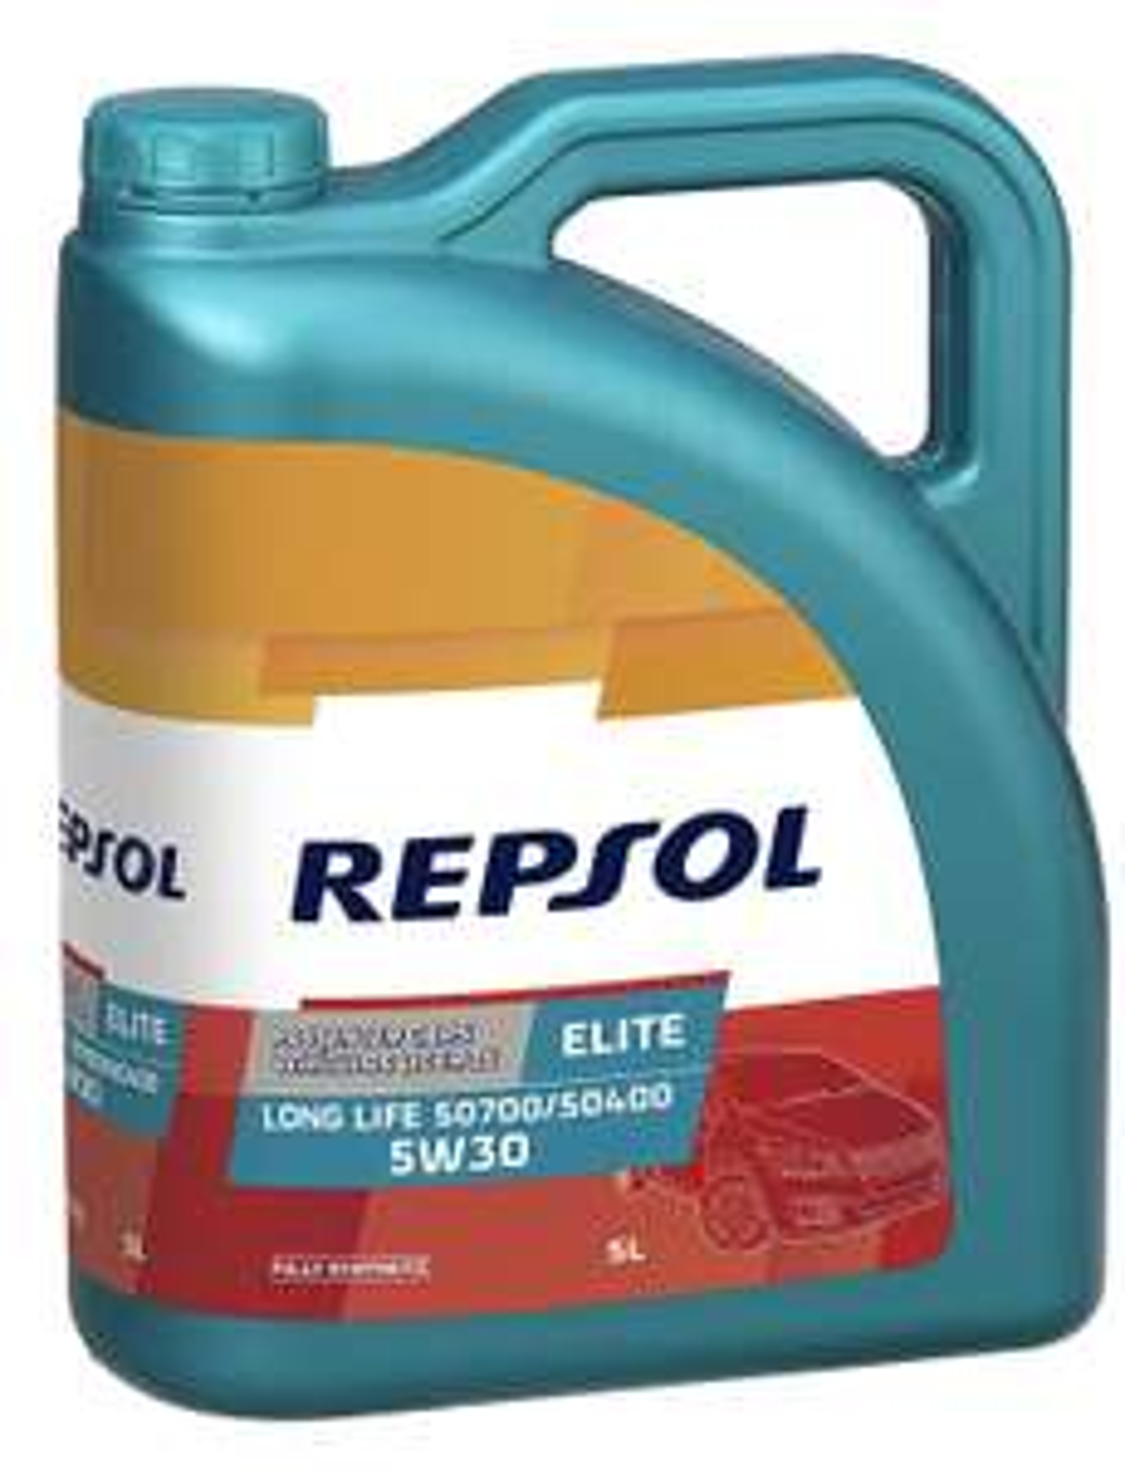 REPSOL MOTORÖL ELITE LONG LIFE 50700/50400 5W-30 5 Liter